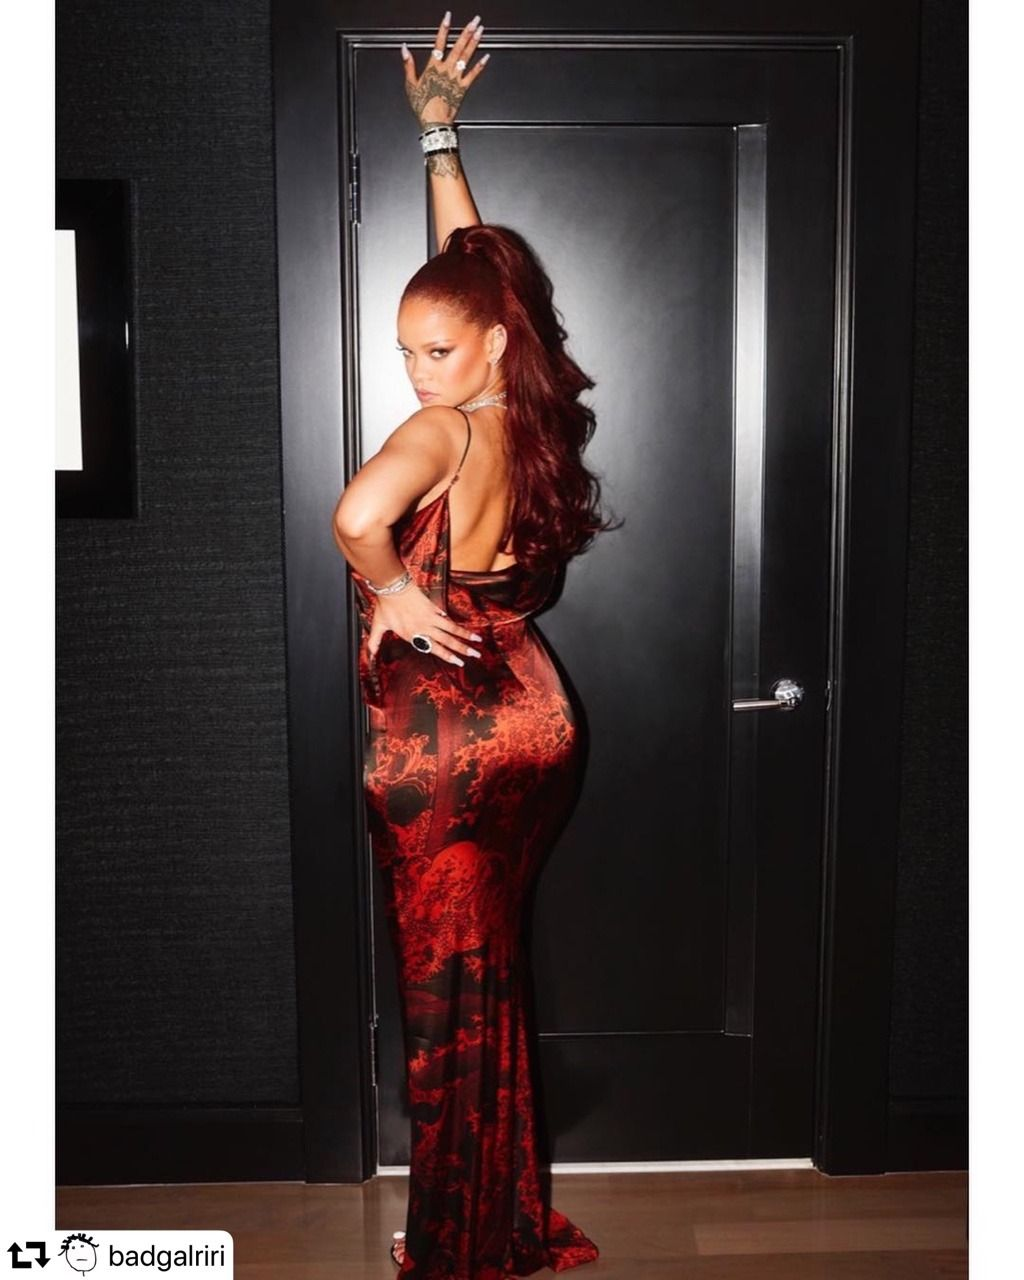 Rihanna | Red carpet fashion, Fashion, Red carpet dresses